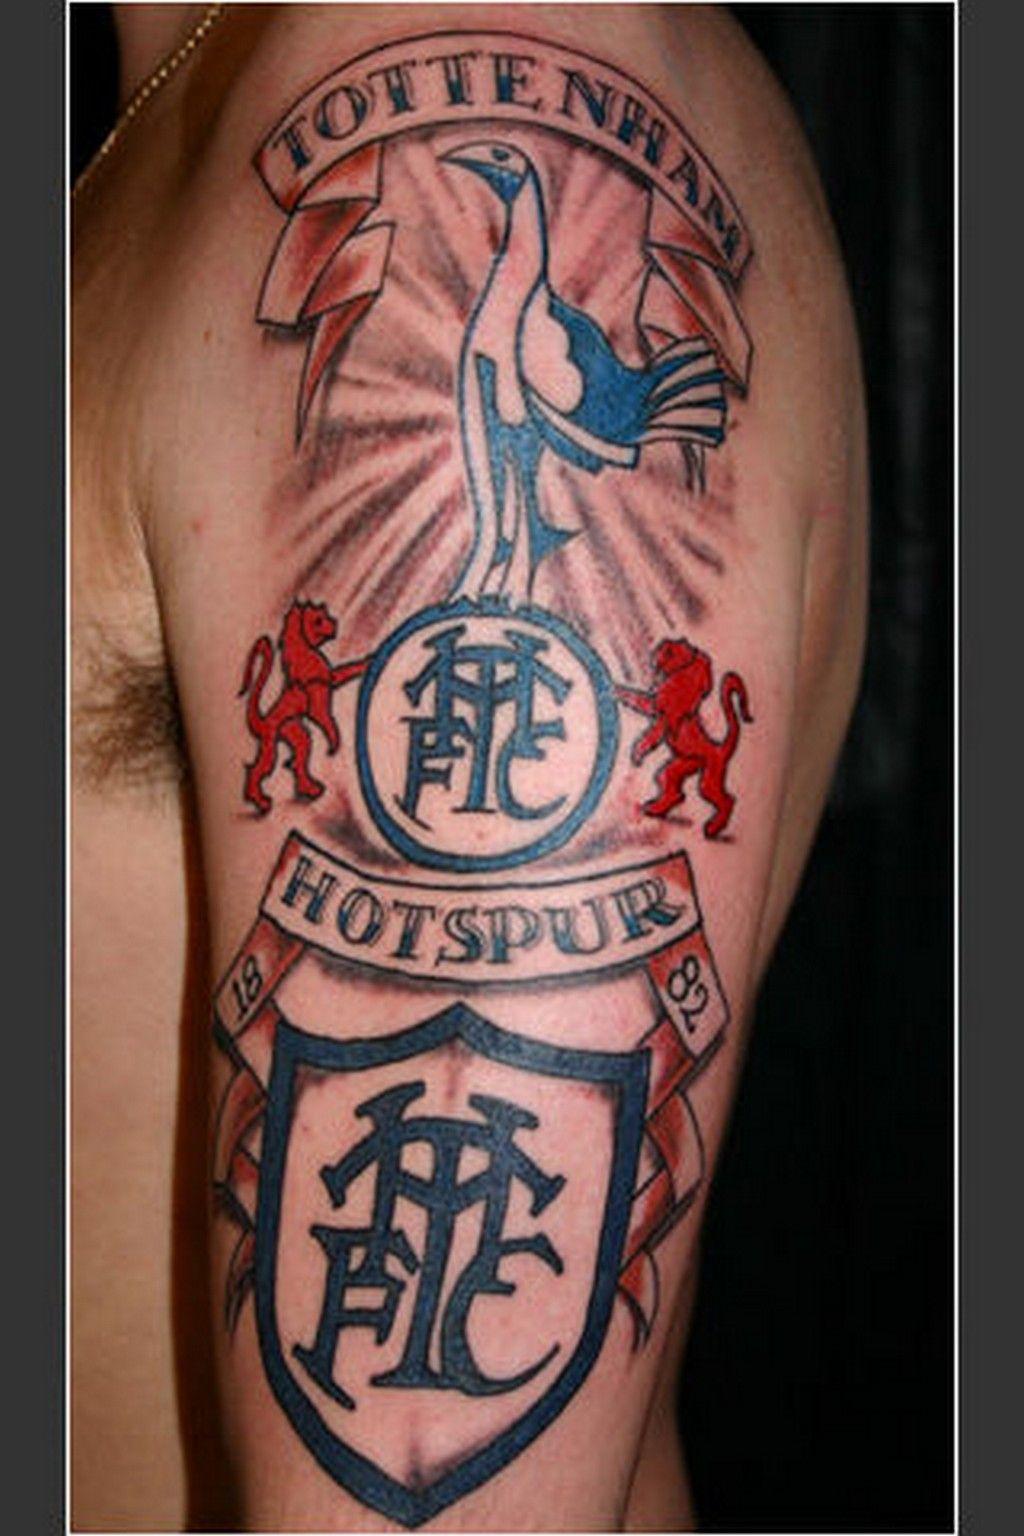 tottenham tattoo - Google Search | Tattoos, Simplicity